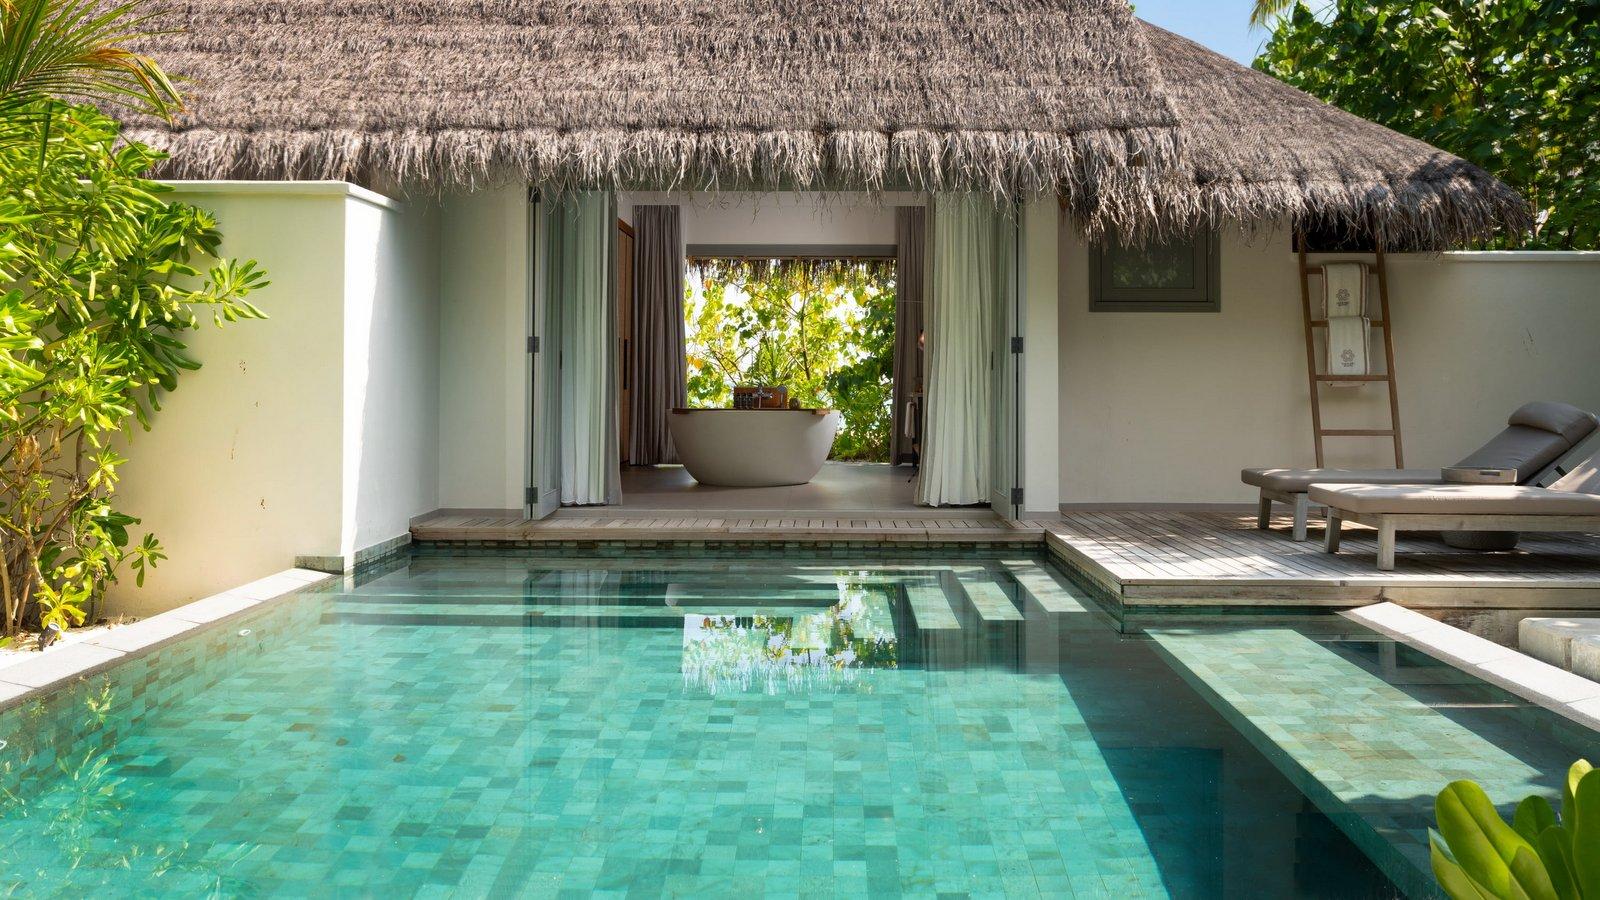 Мальдивы, отель Vakkaru Maldives, номер Beach Pool Residence